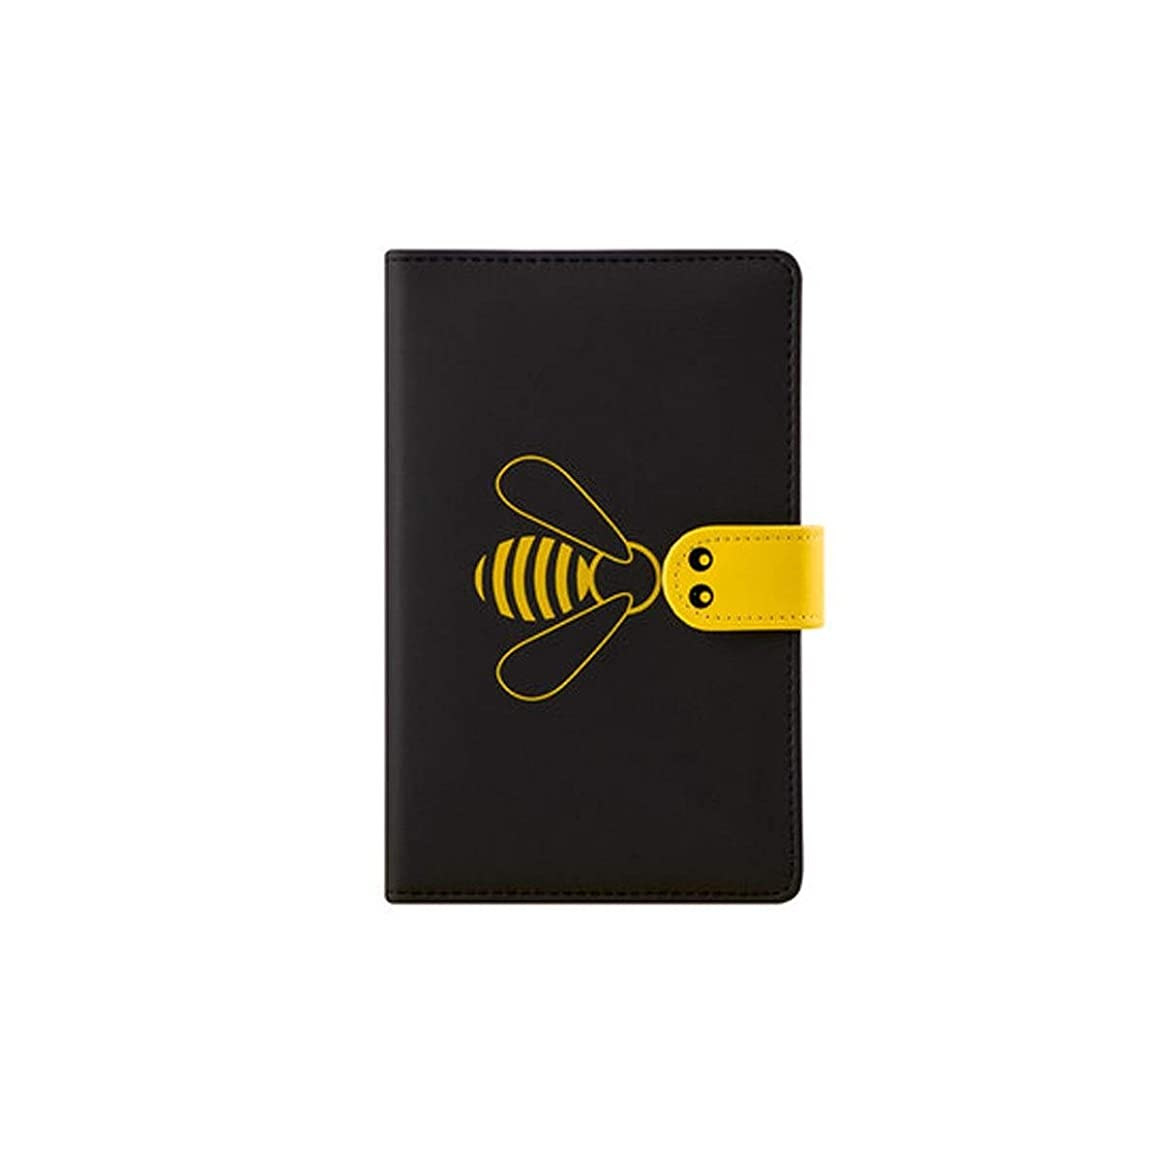 XIONGHAIZI ハンドアカウント帳、女の子の心の格子縞のピクセル絵画グリッド、人格クリエイティブかわいいポータブルノート、空白の内側のページの正方形の本の日記、ノート、文芸絶妙な小さな新鮮な黒、黄色2 (Color : Black)